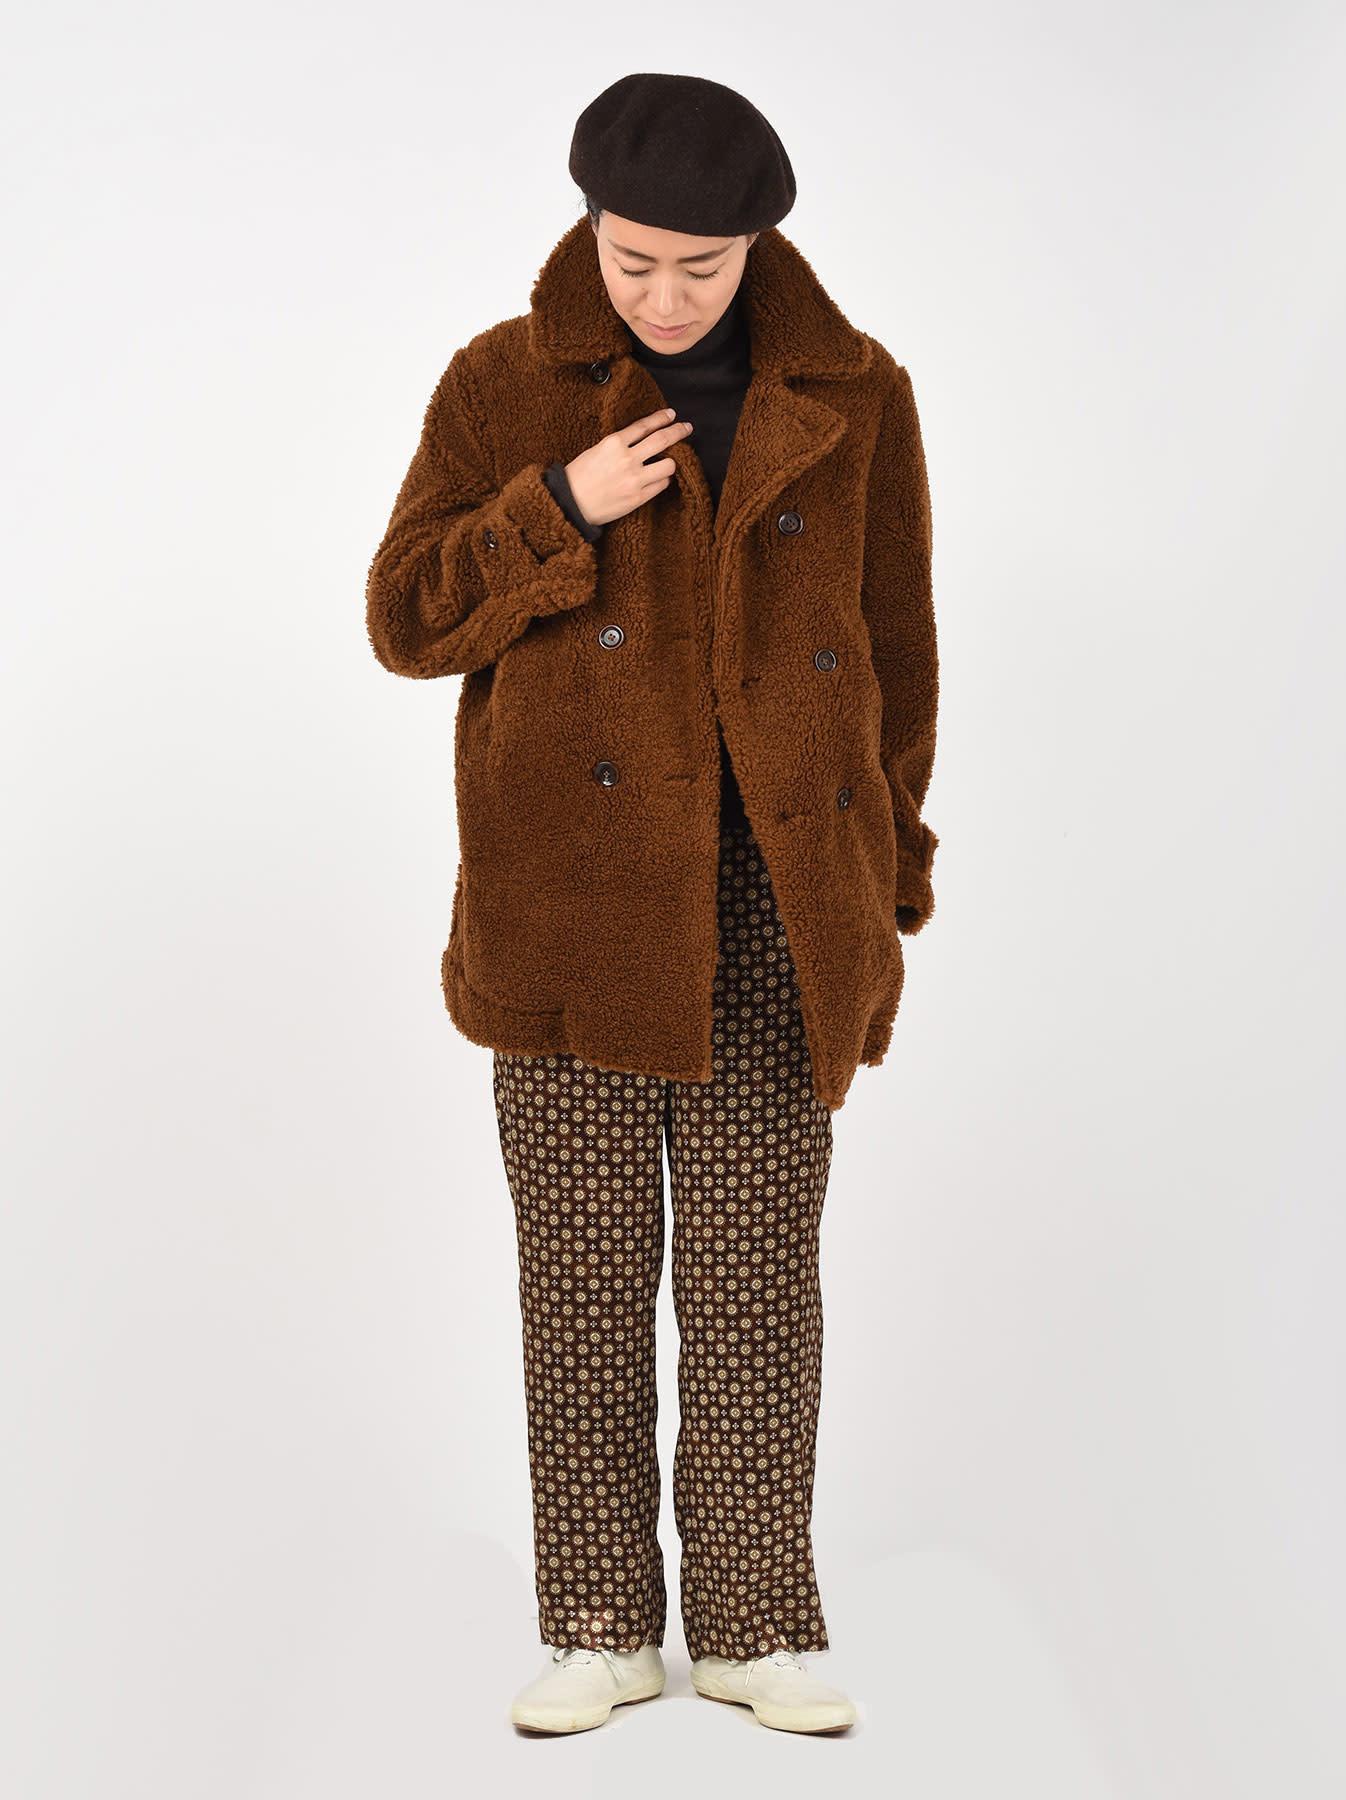 Sheep Boa 908 P-coat-2